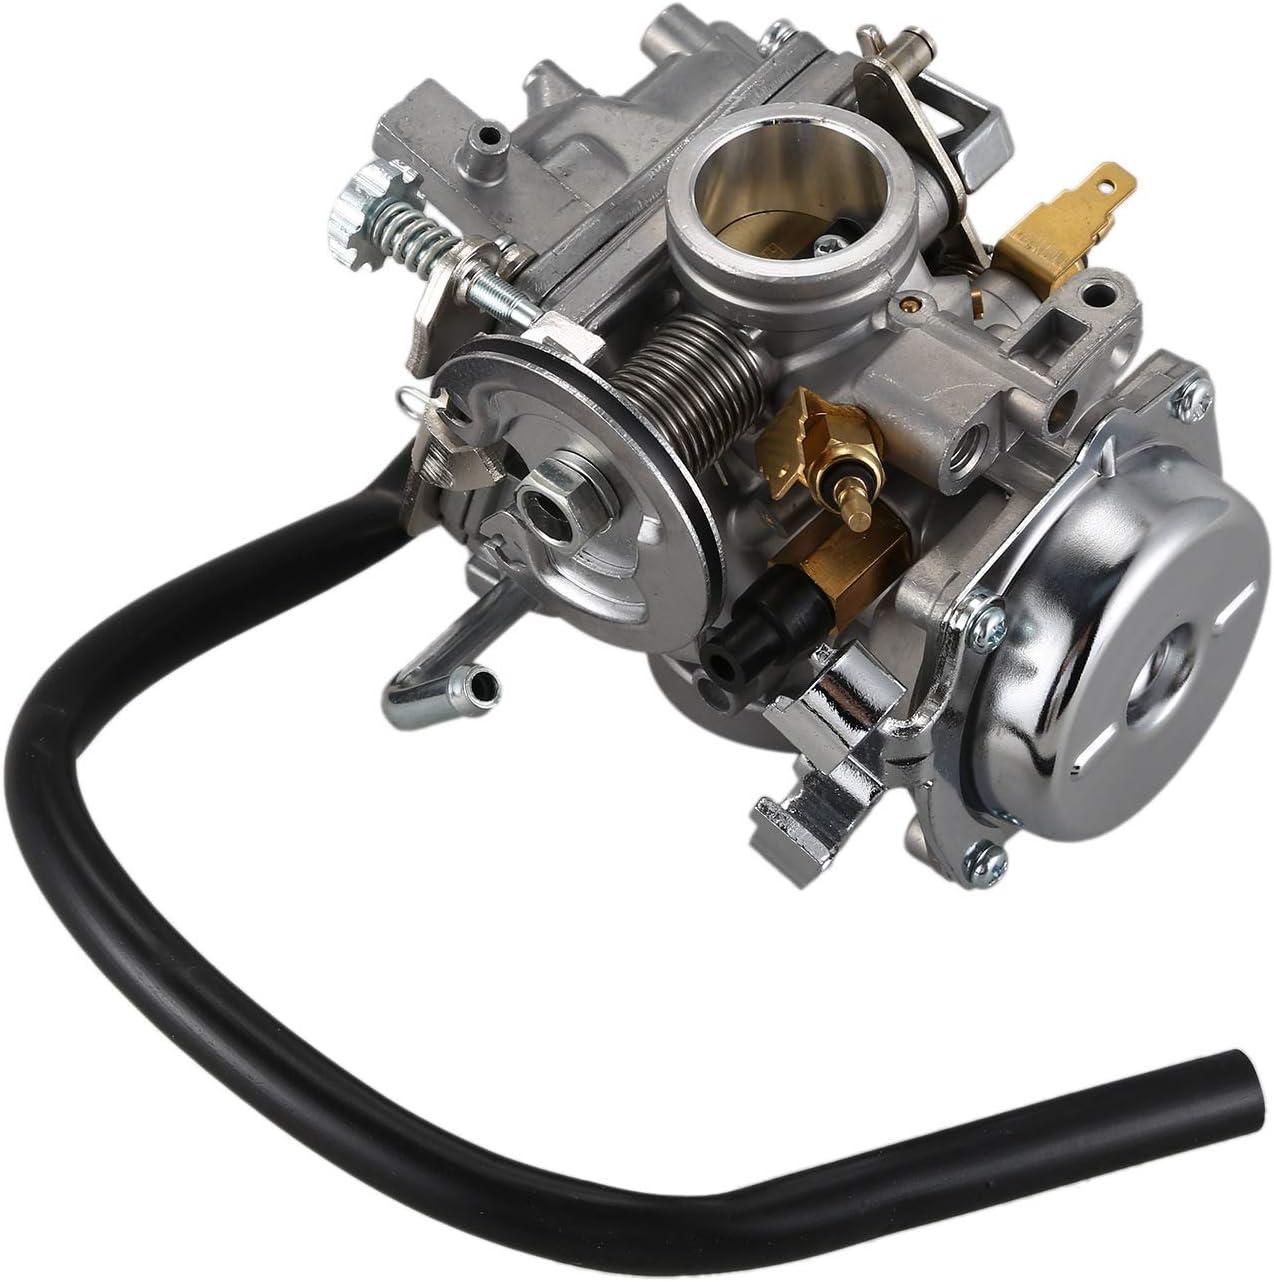 Cavis Carburatore XV250 XV125 QJ250 XV 250 XV 125 Alluminio Carburatore Assy per Virago 125 XV125 1990-2014